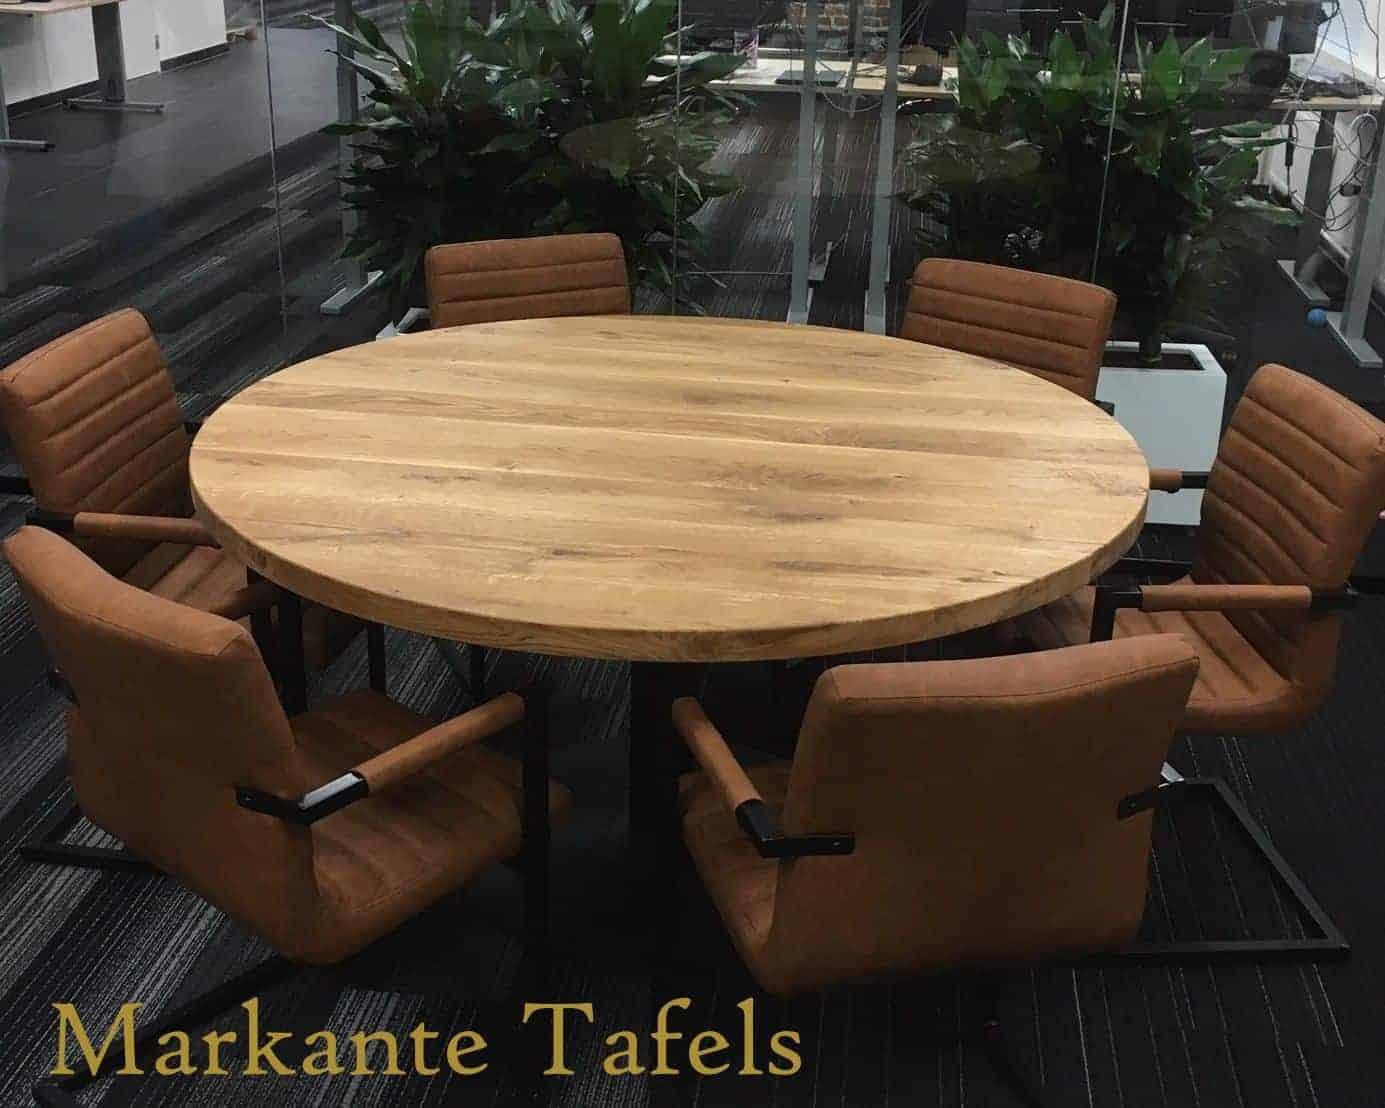 Ongebruikt Ronde tafel - Markante Tafels PH-42